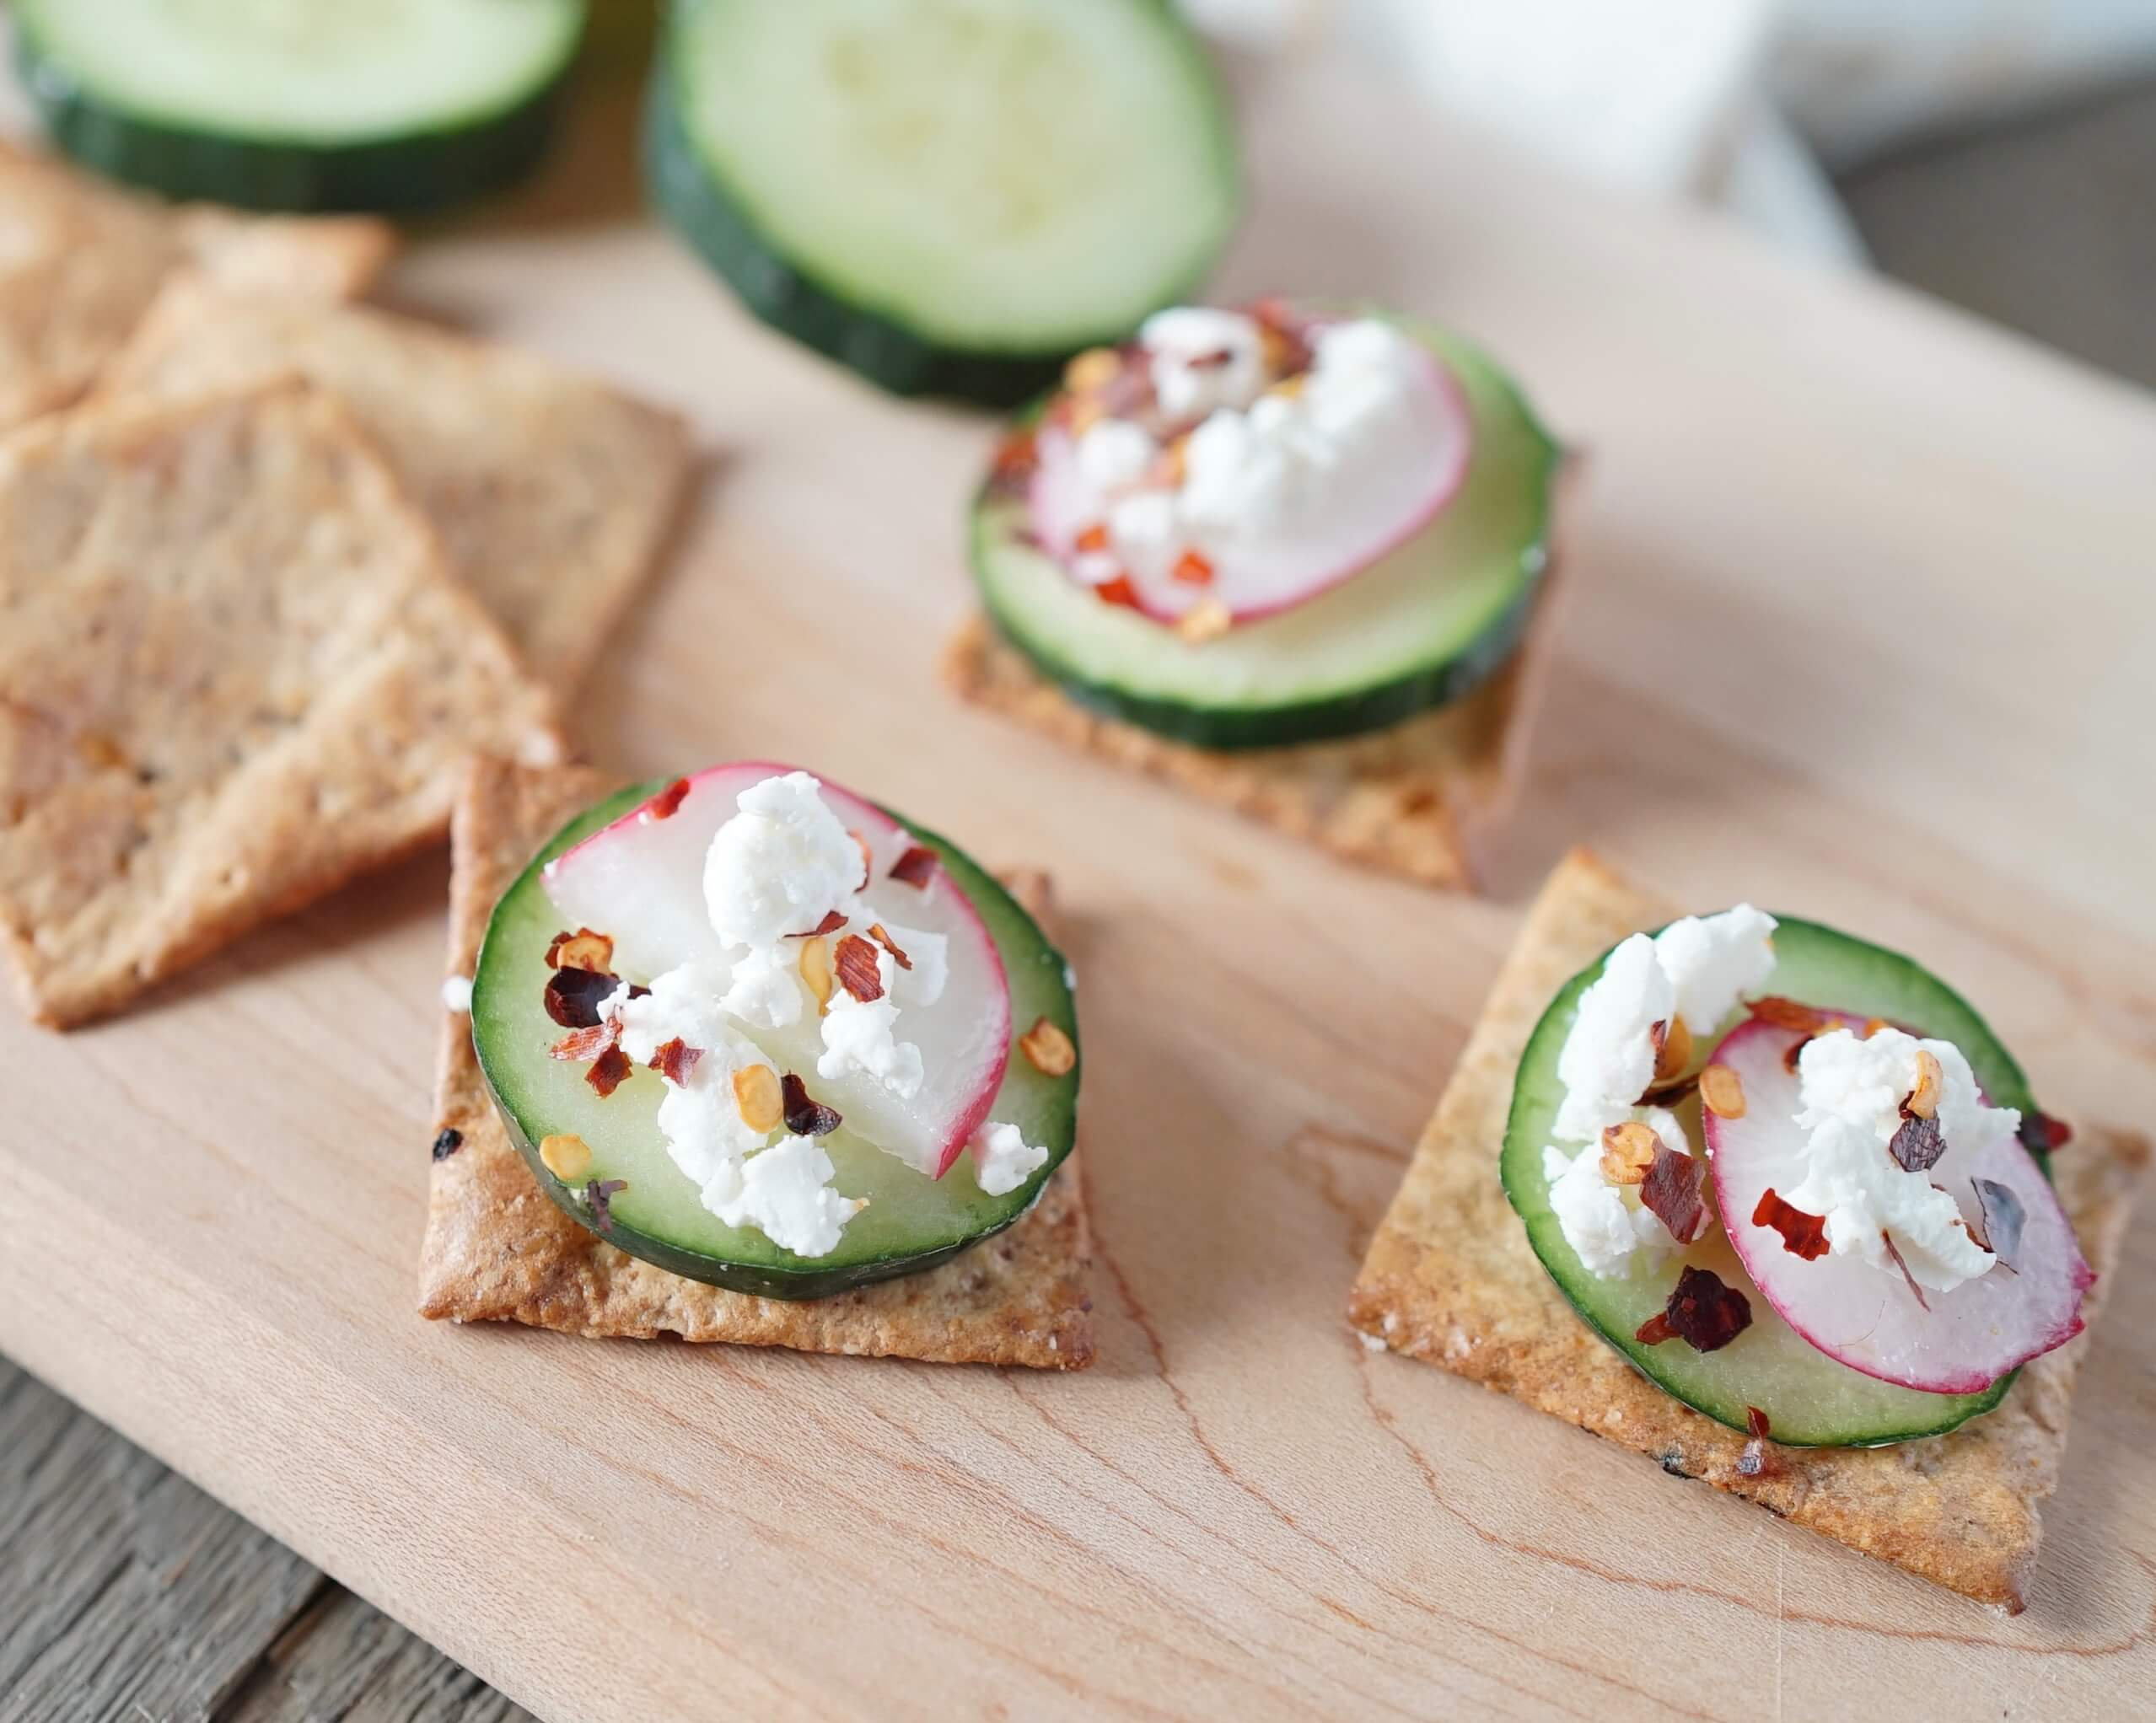 Cucumber and Radish Crackers